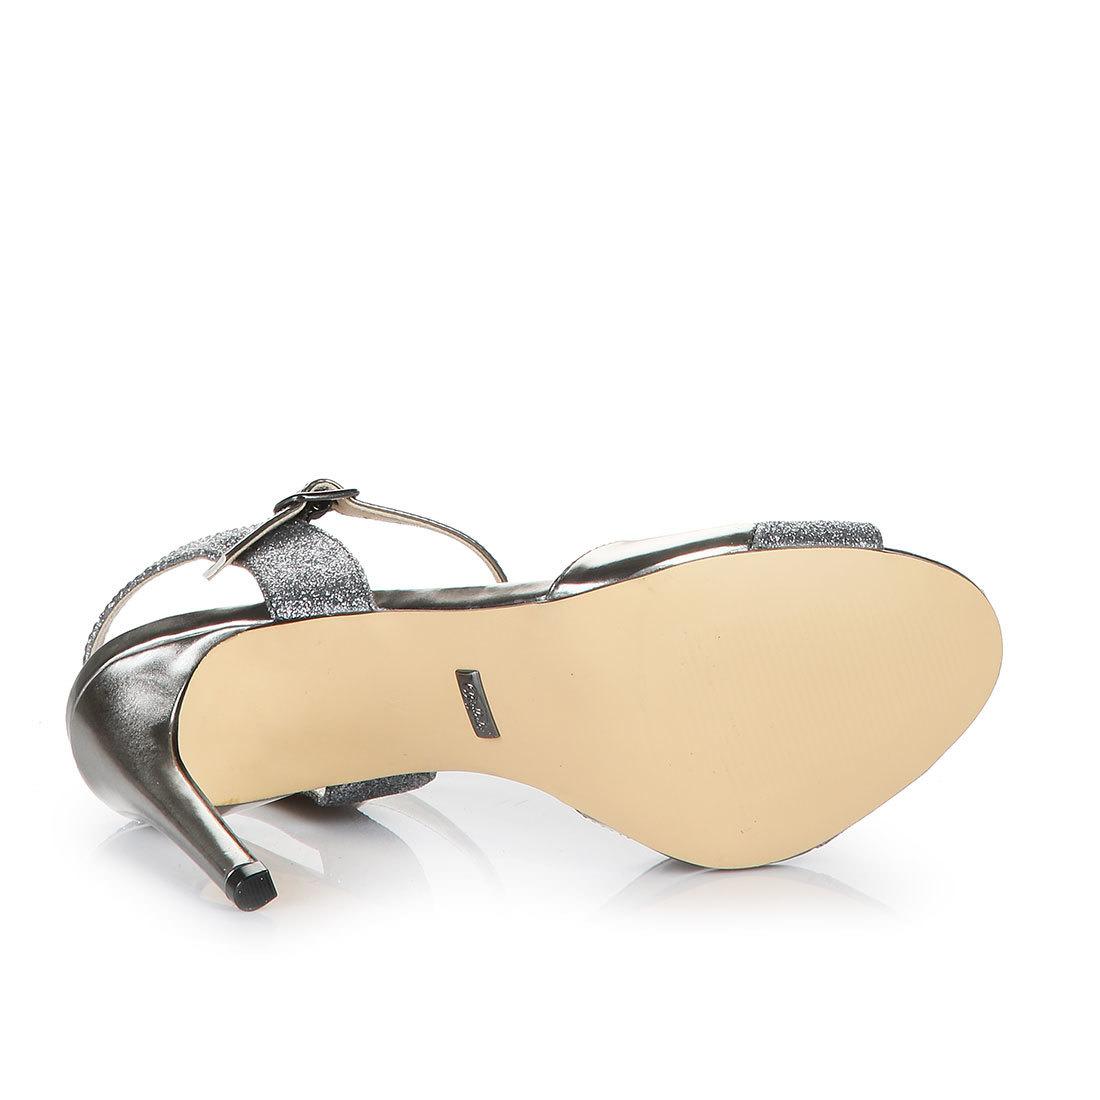 Buffalo Sandalette Metallic Anthrazit Optik In N0m8vOynw